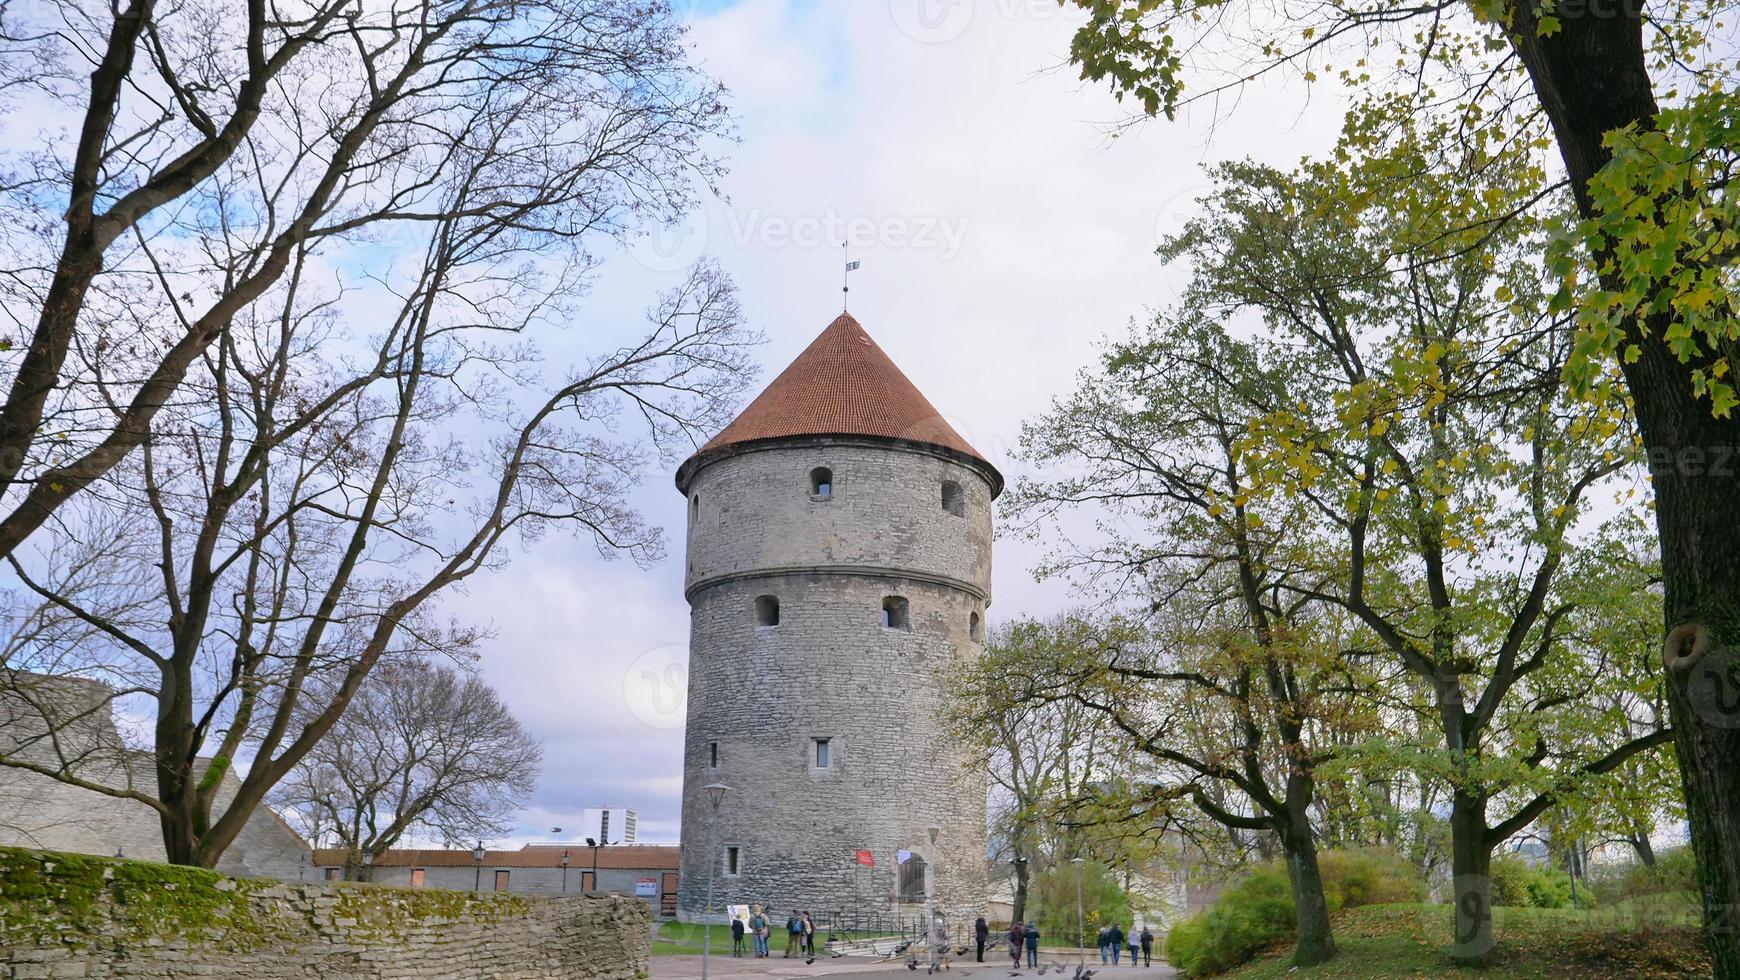 architecturesix-story artillery tower in Tallinn photo